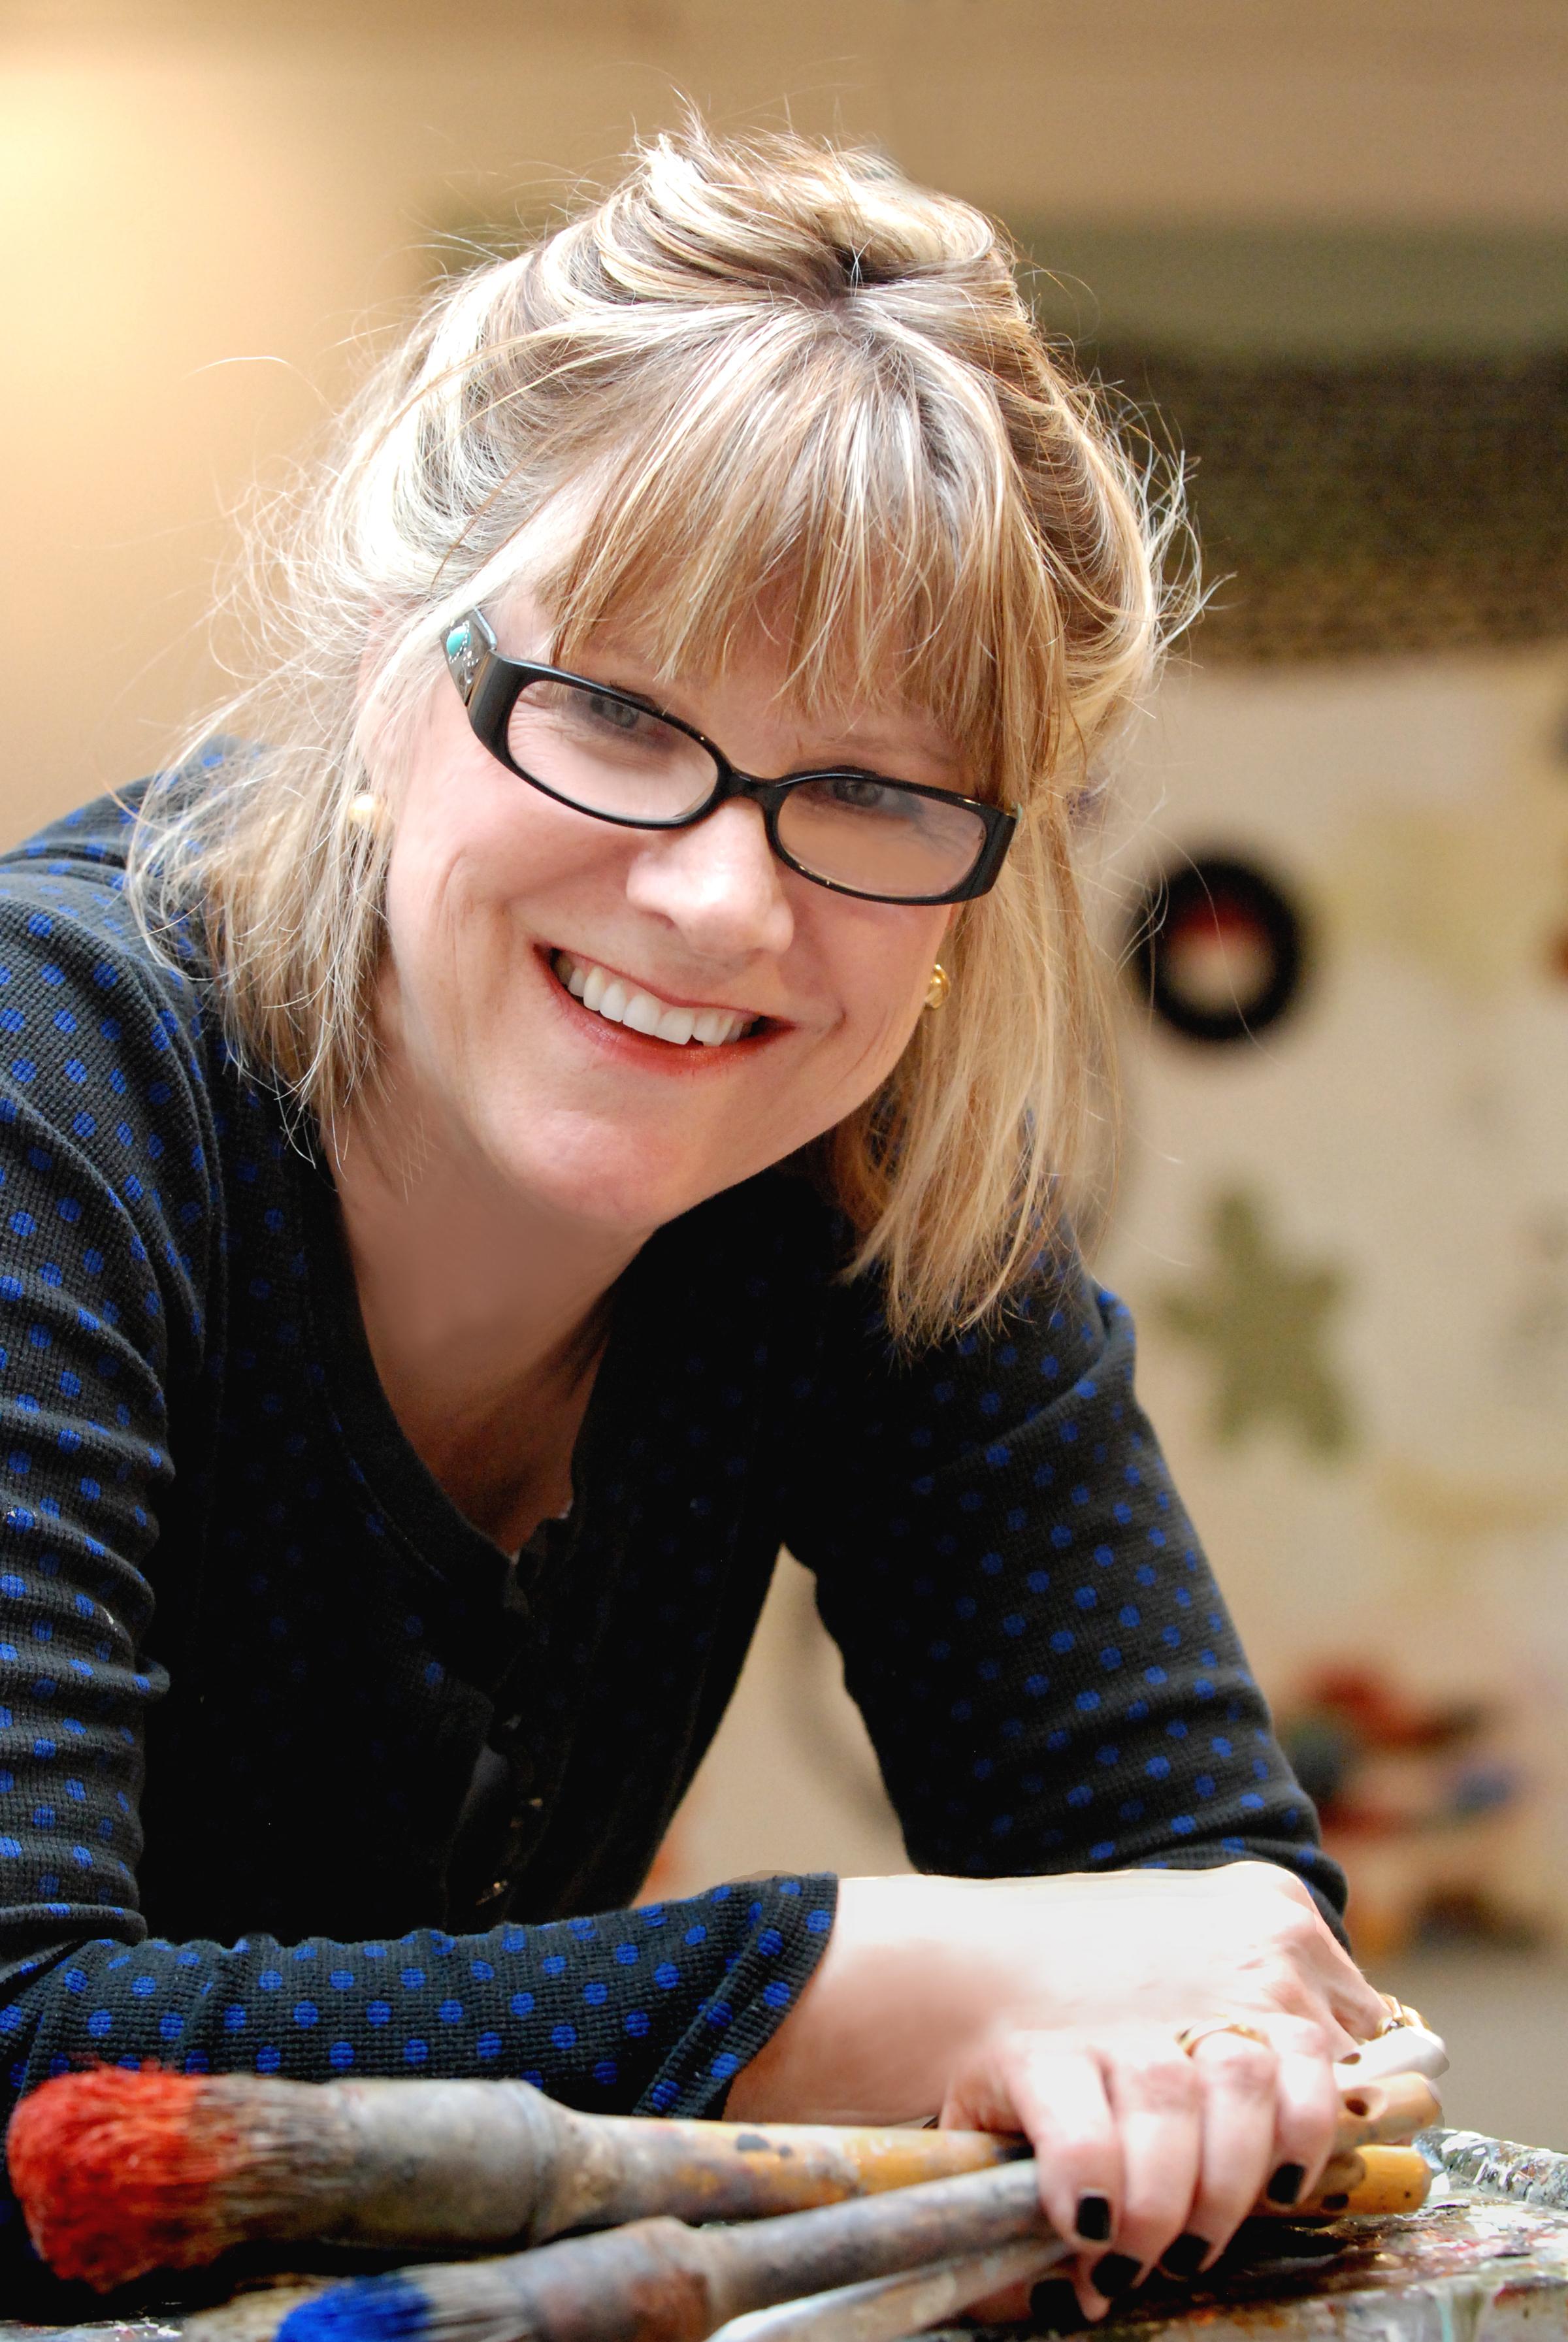 Pollock-Krasner Foundation Names Winners of $3 M. in Grants